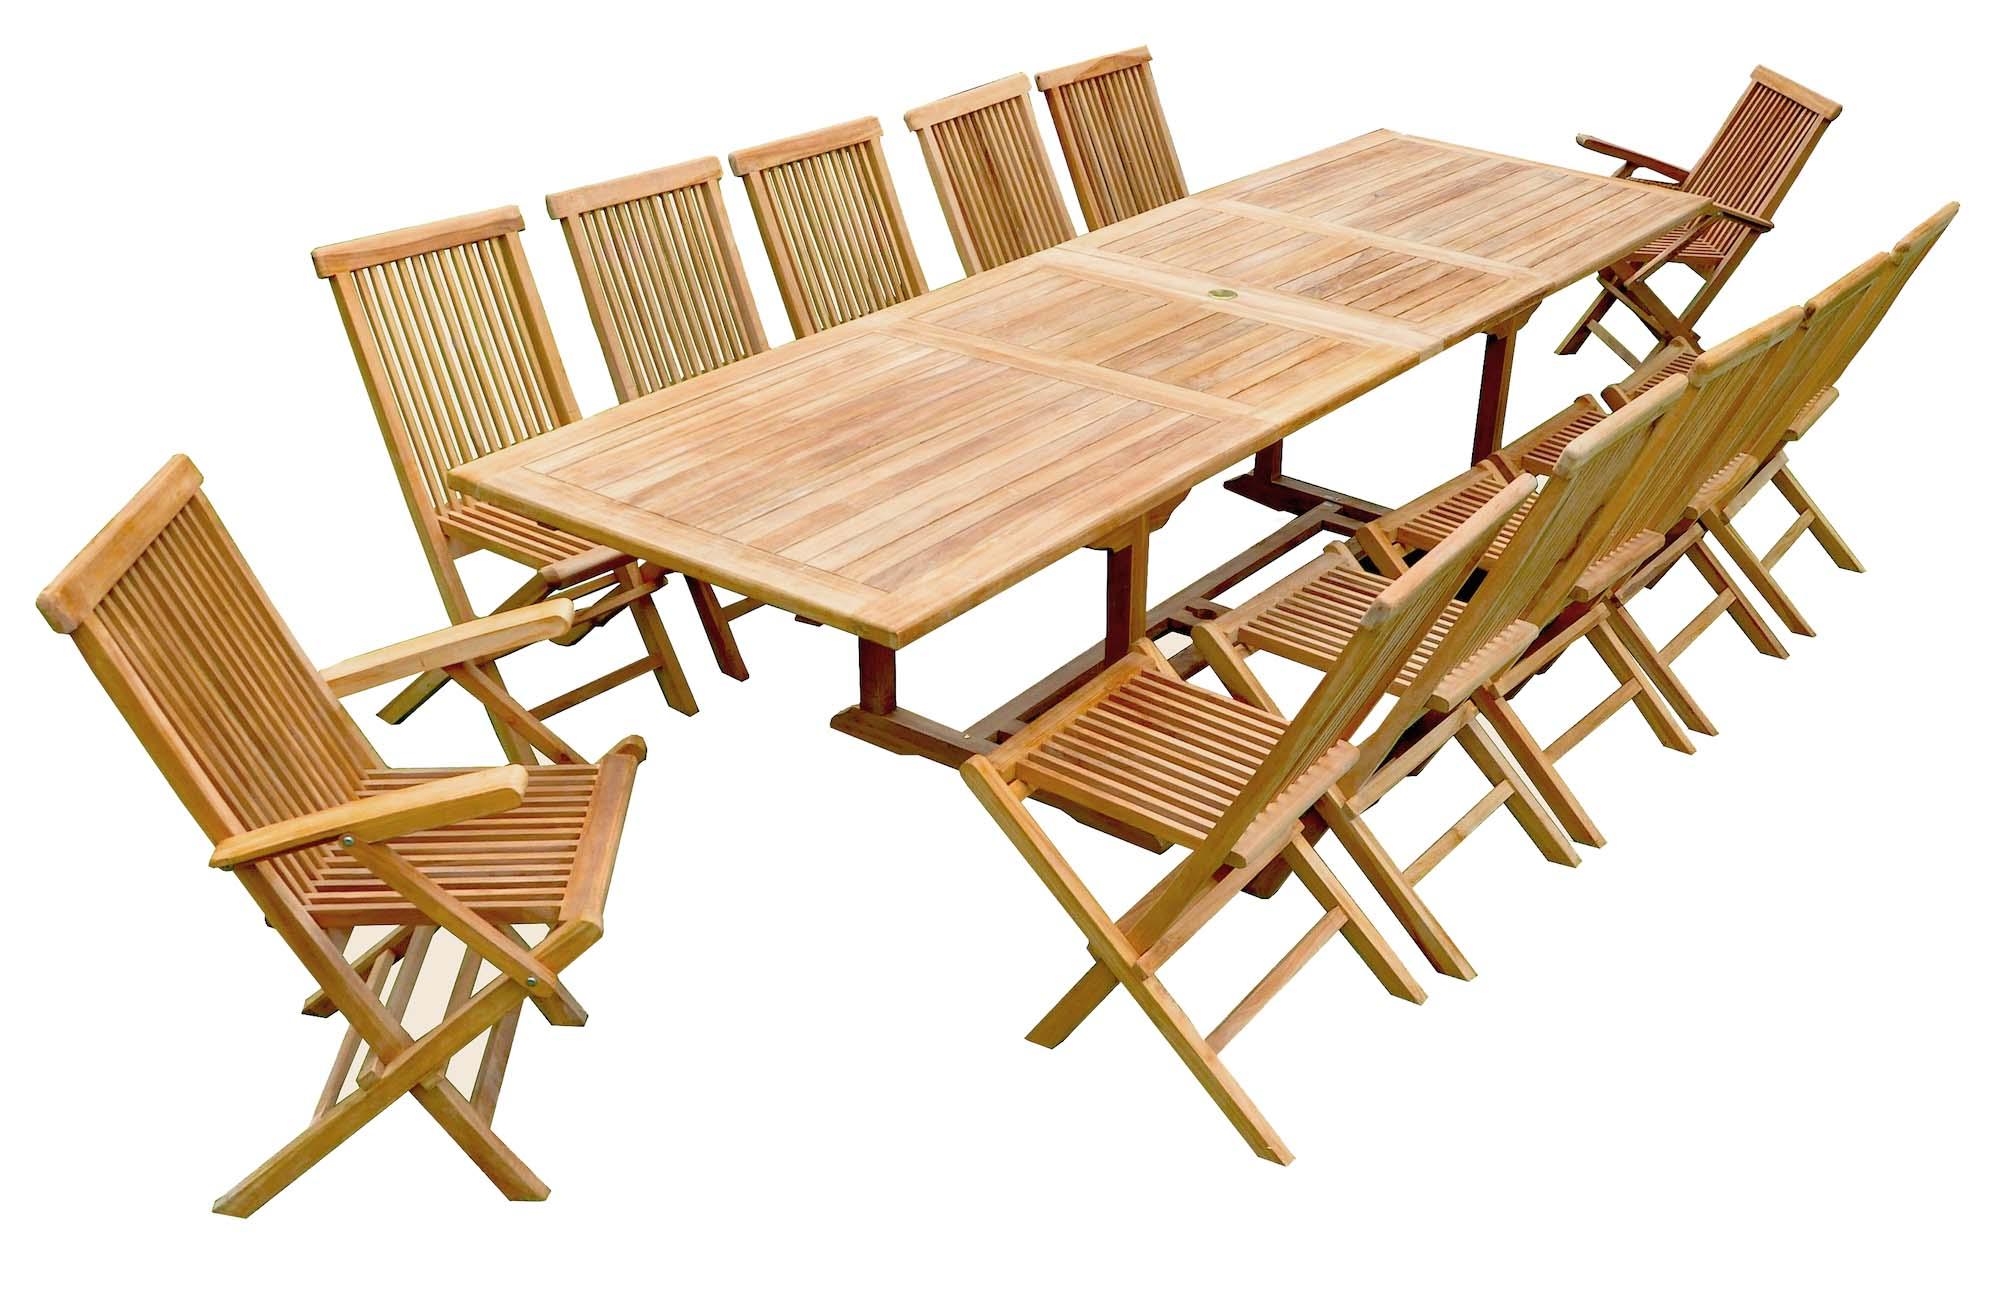 salon de jardin teck table rallonge 10 chaises 2 fauteuils. Black Bedroom Furniture Sets. Home Design Ideas